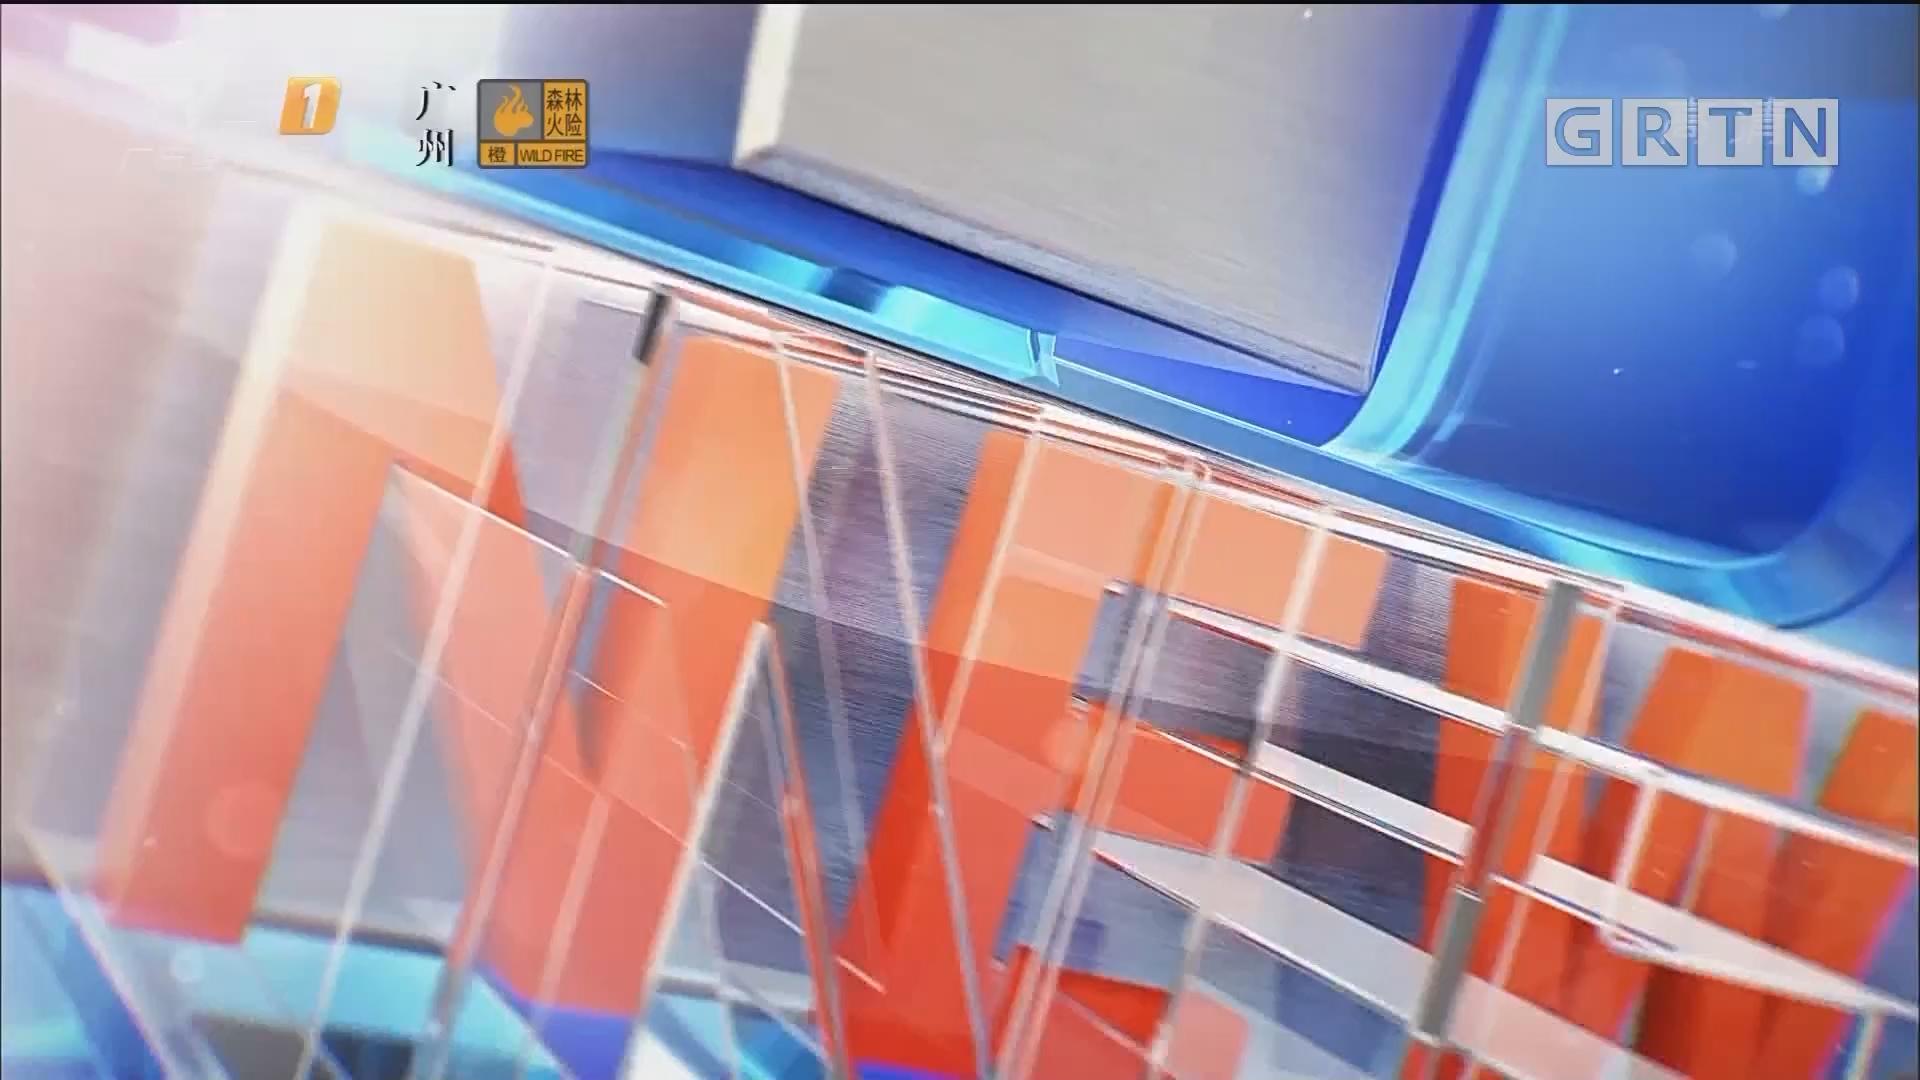 [HD][2019-11-03]南方财经报道:严厉谴责!新华社亚太总分社遭纵火